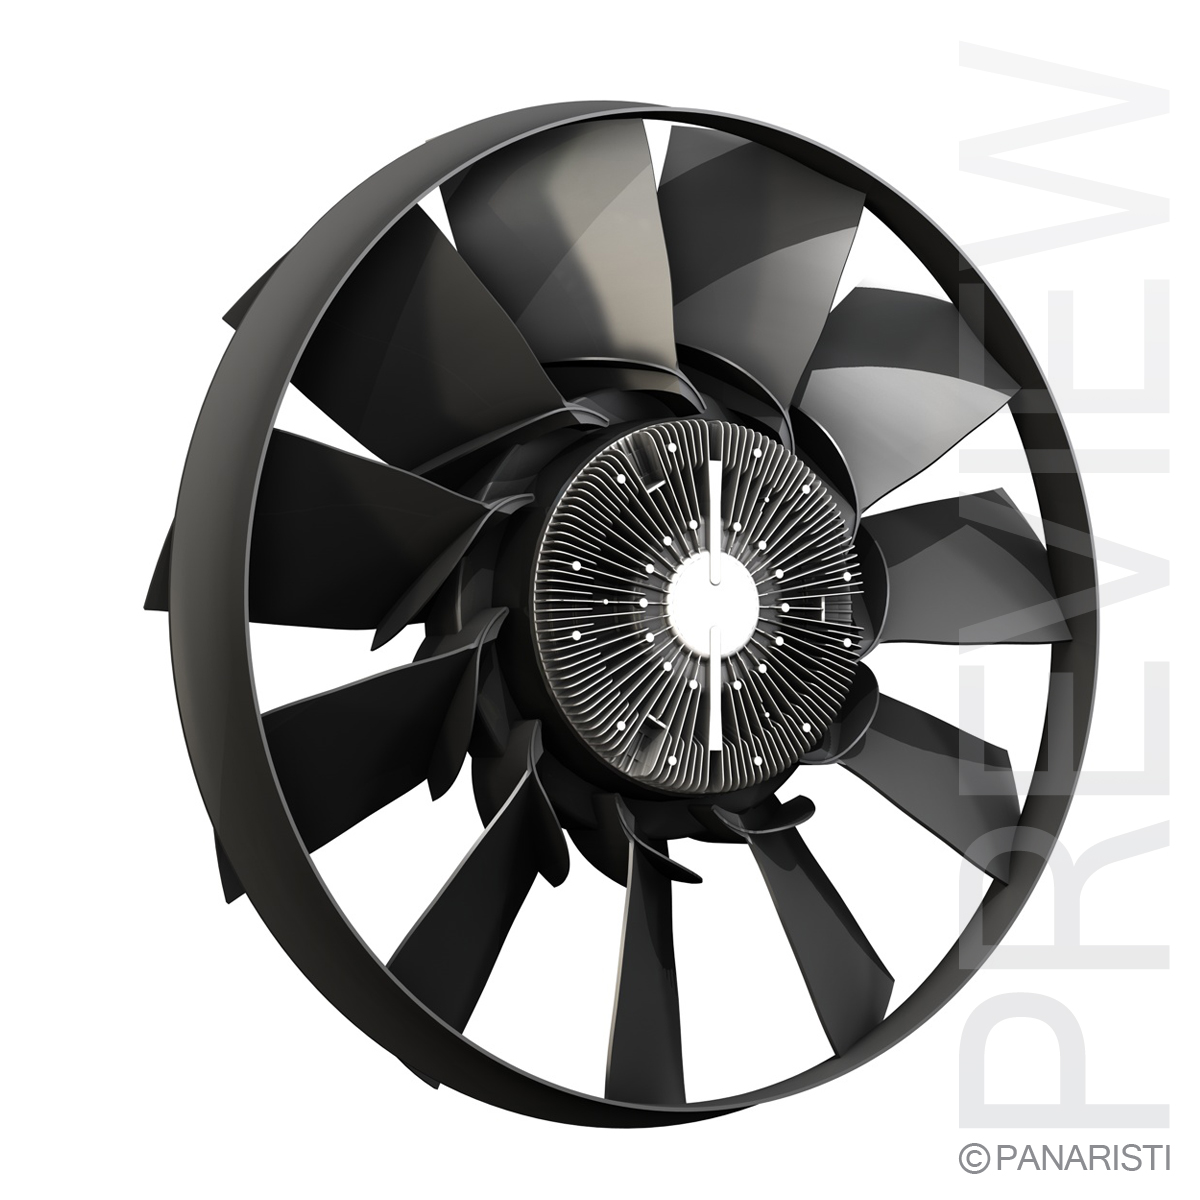 Engine cooling fan 2 3d model 3ds c4d lwo lws lw obj 129278